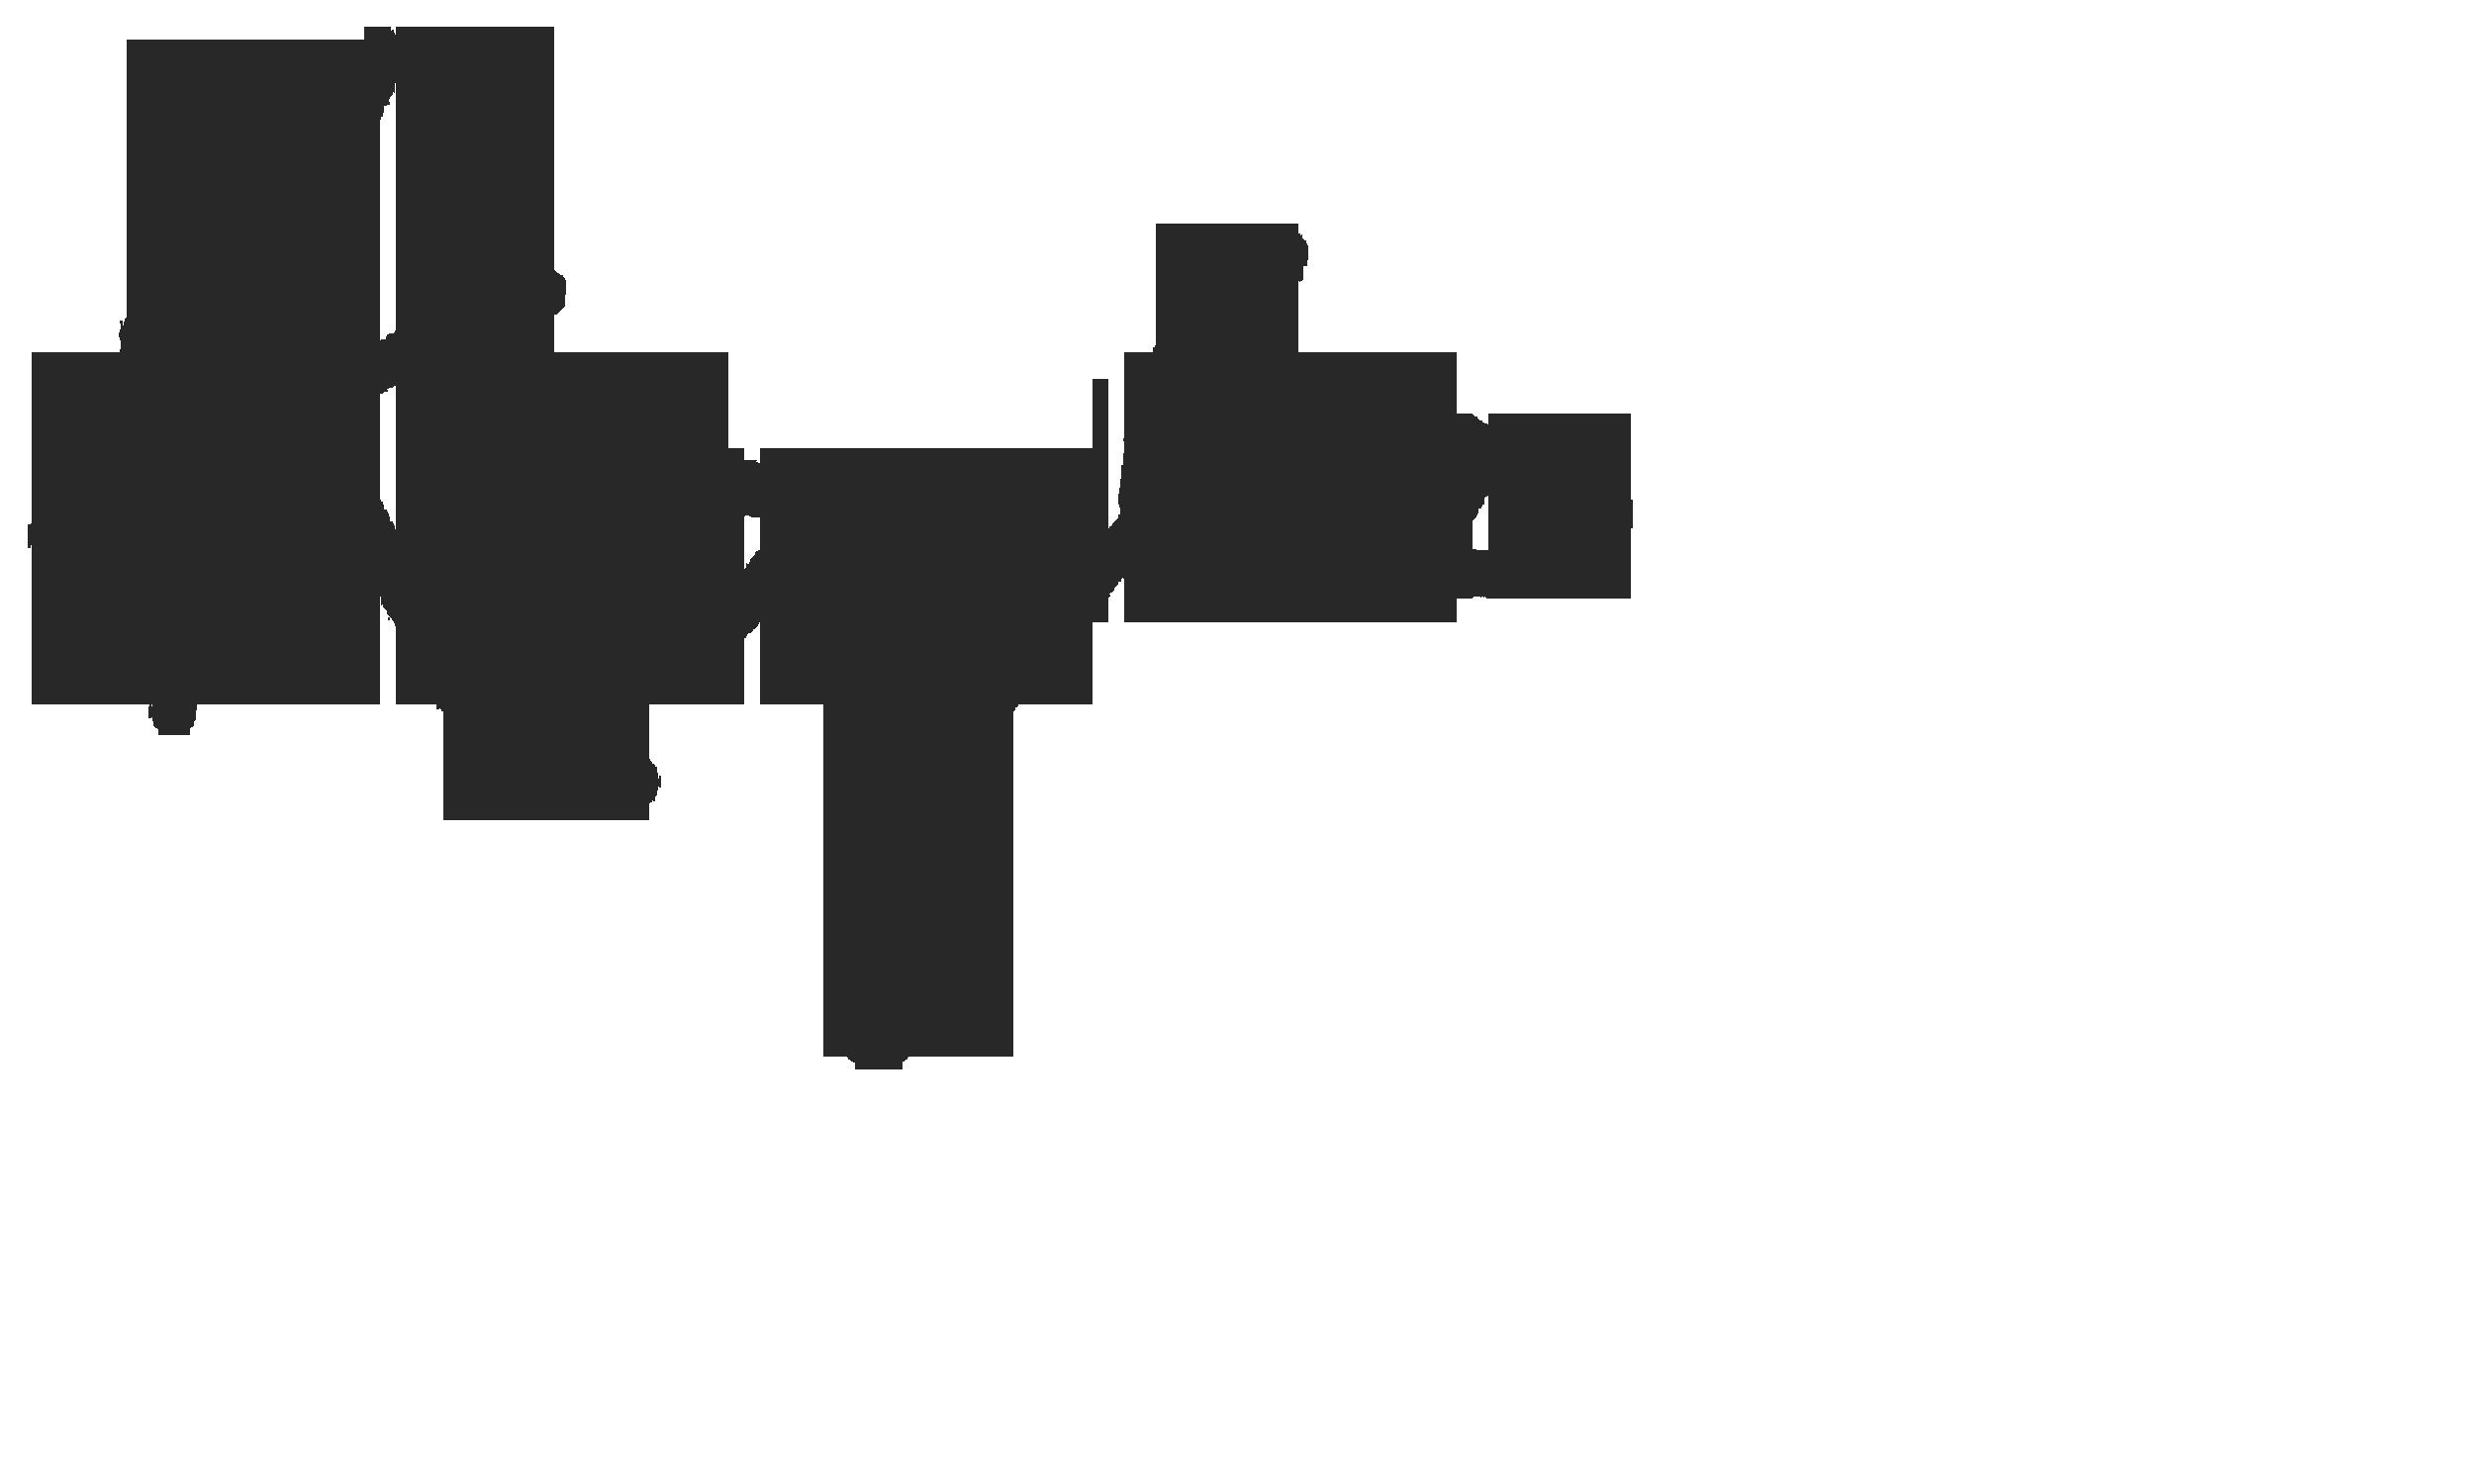 kaylee_signature.png